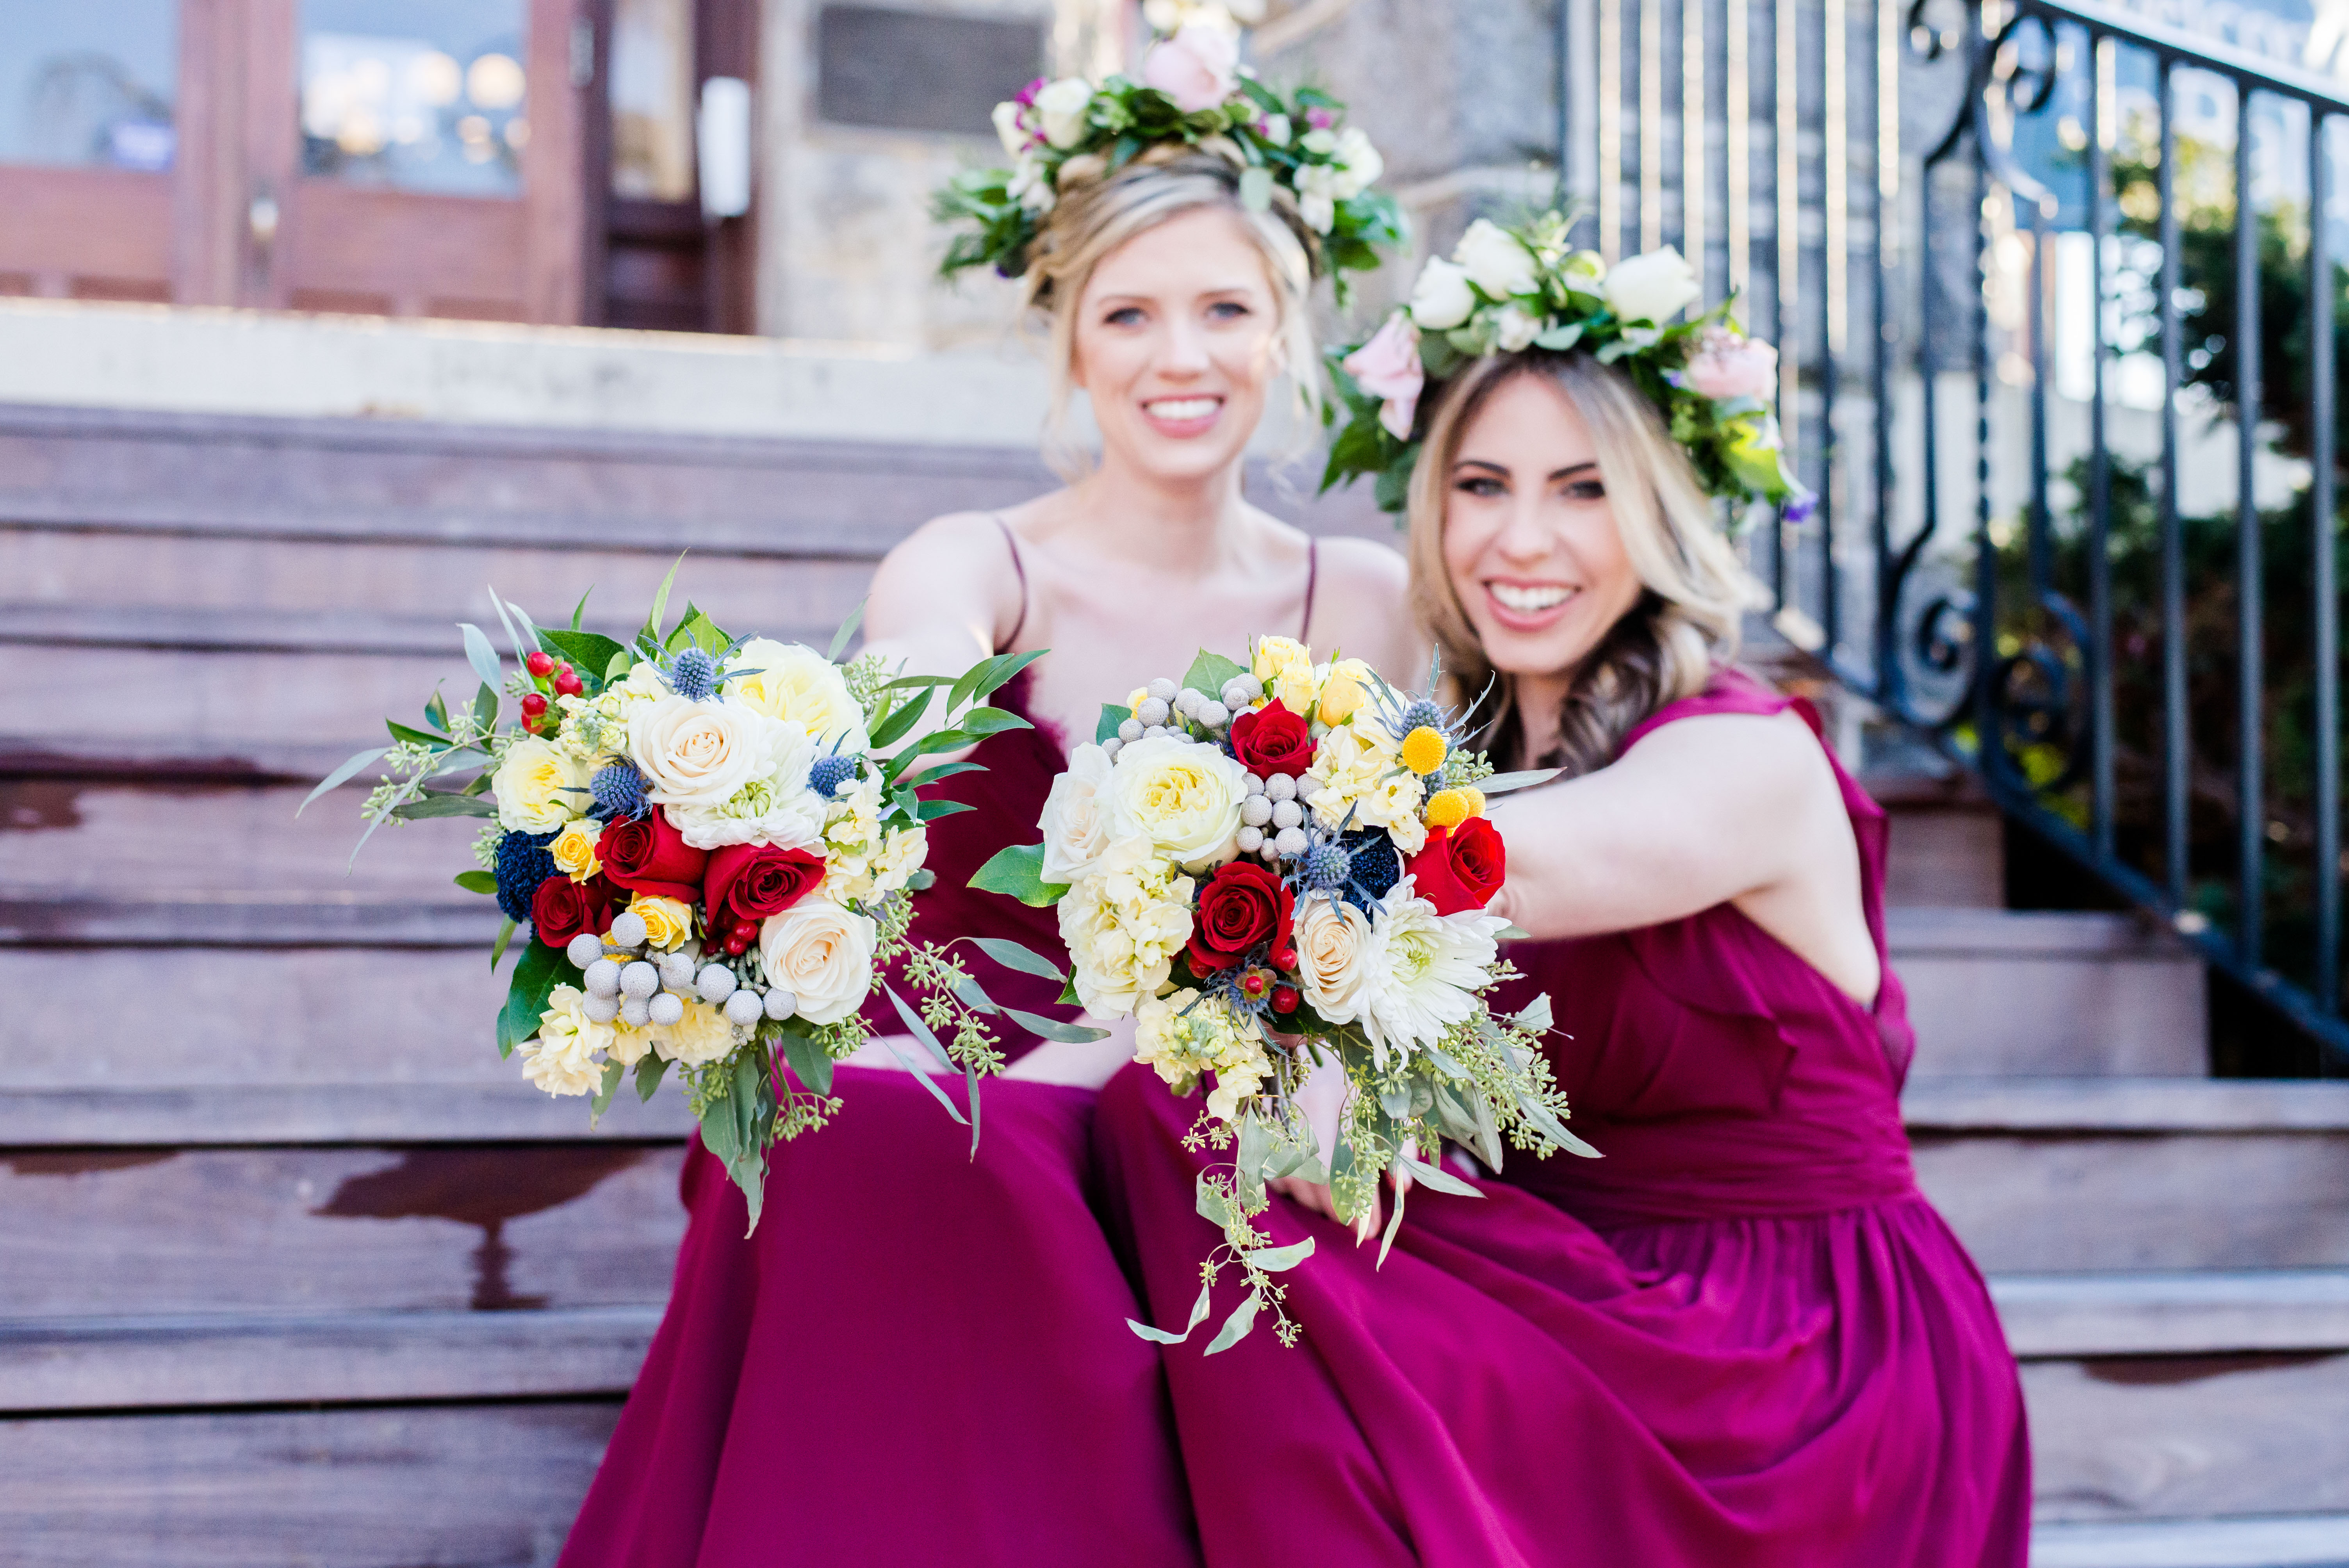 Baldwin-School-Wedding-Photographer-Event-Venue-Pennsylvania-Mainline-Andrea-Krout-Photography-19